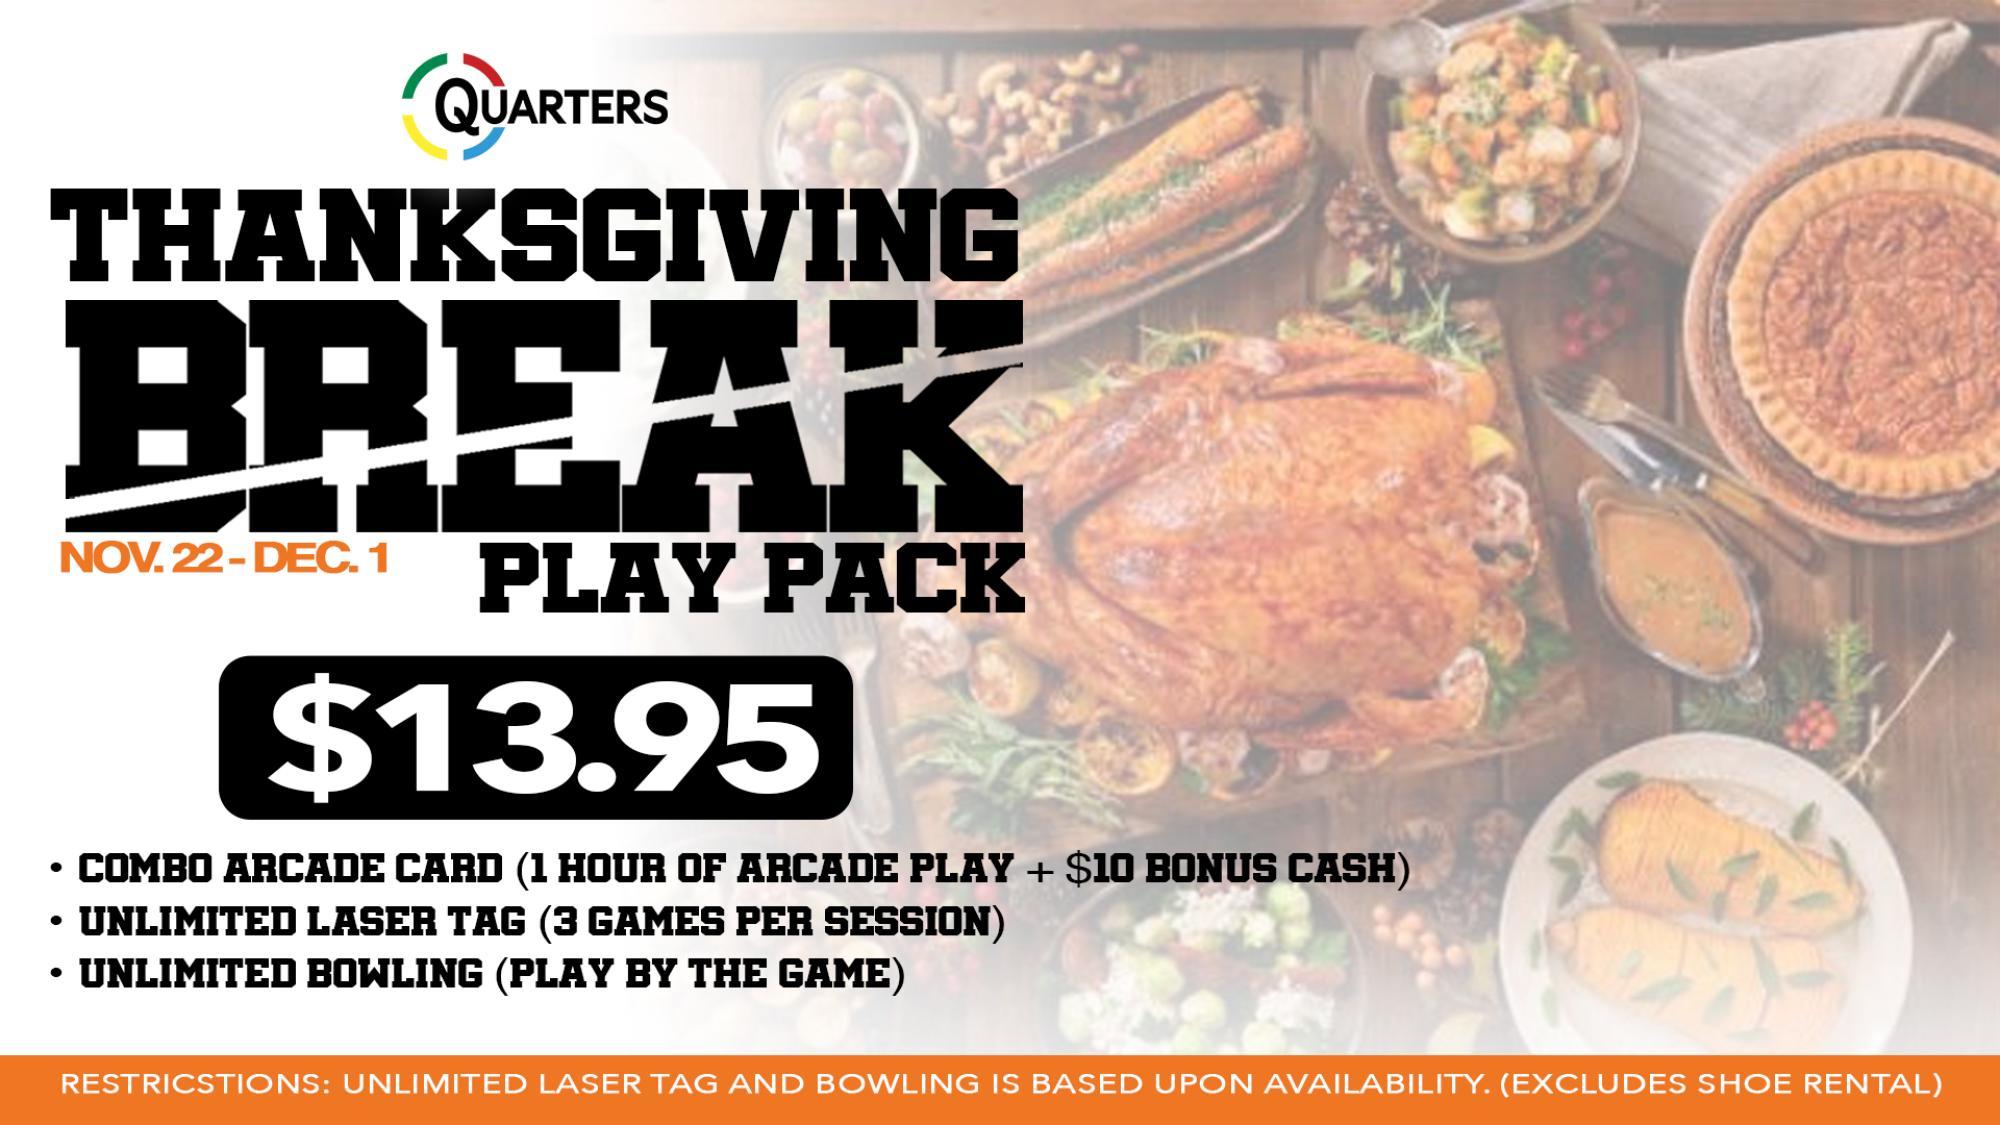 Thanksgiving Break wide